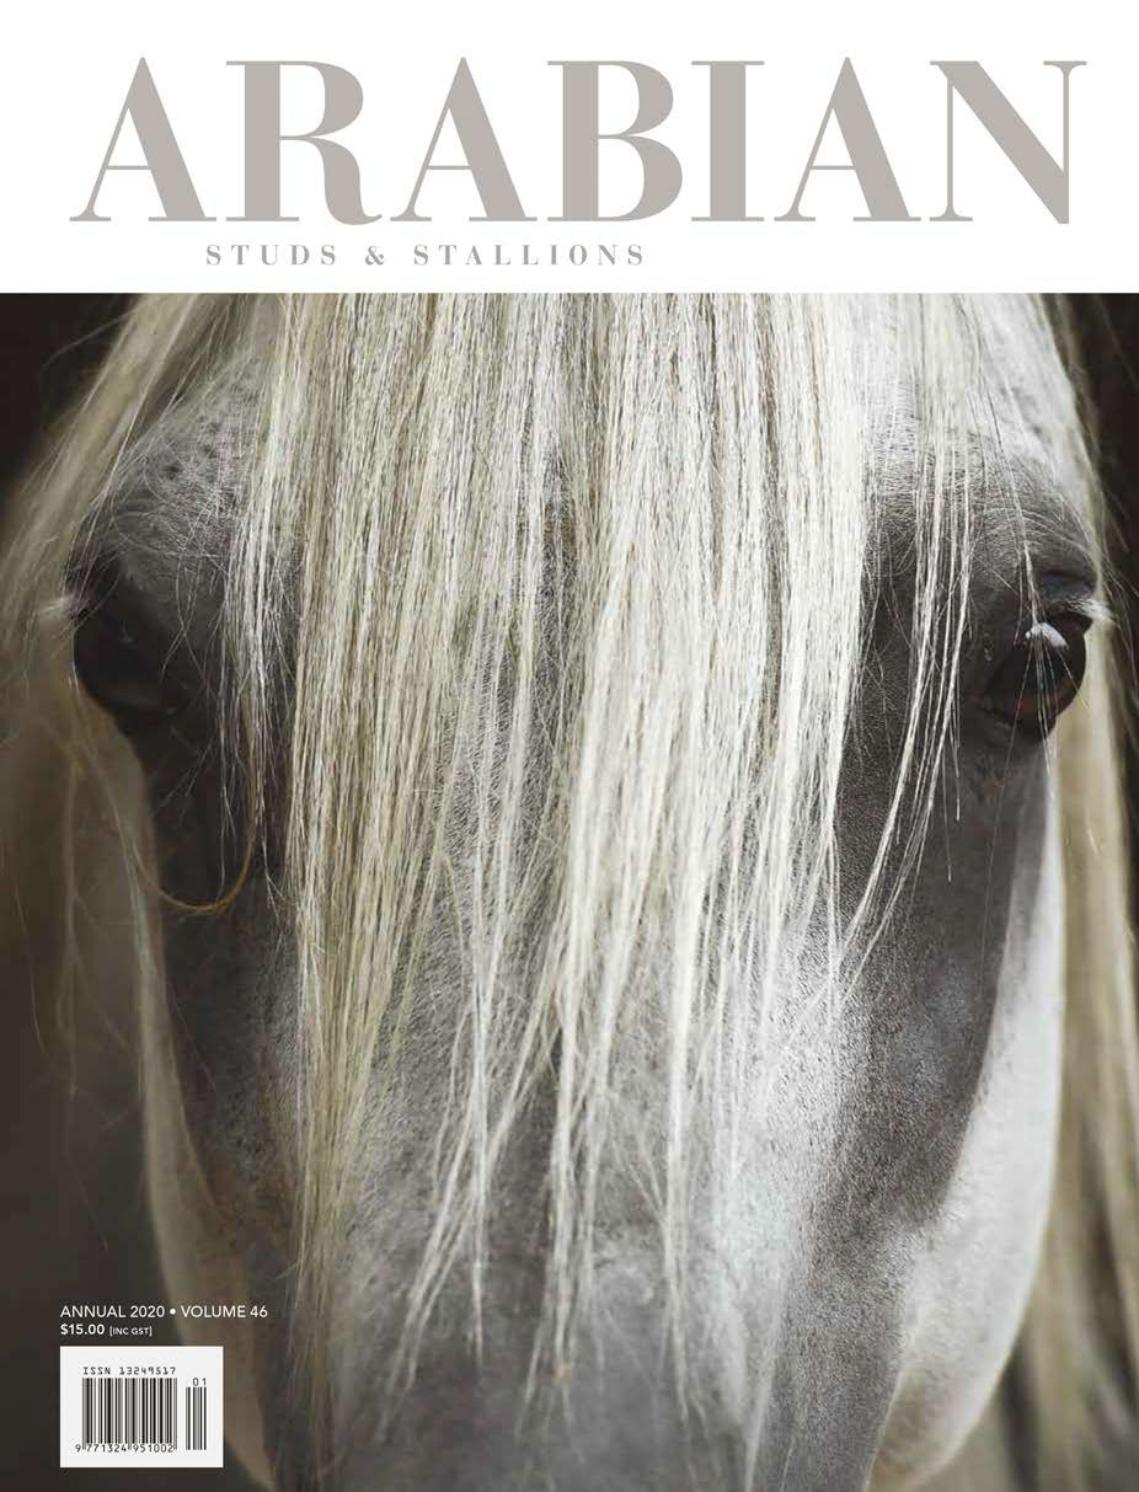 Arabian Studs Stallions Volume 46 Annual 2020 By Vink Publishing Issuu